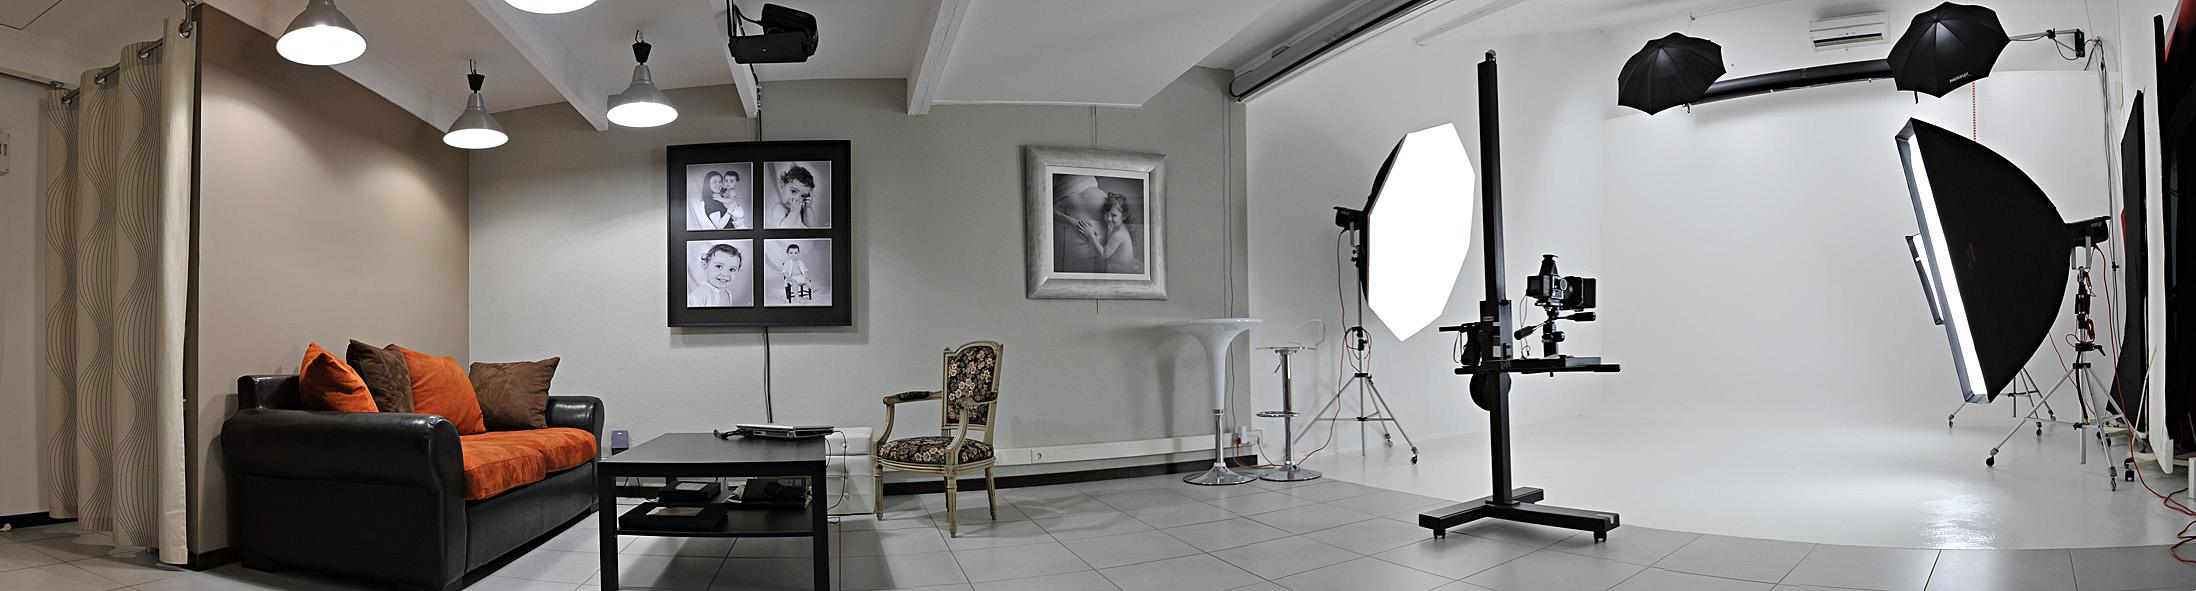 imagesformation-photographie-75.jpg